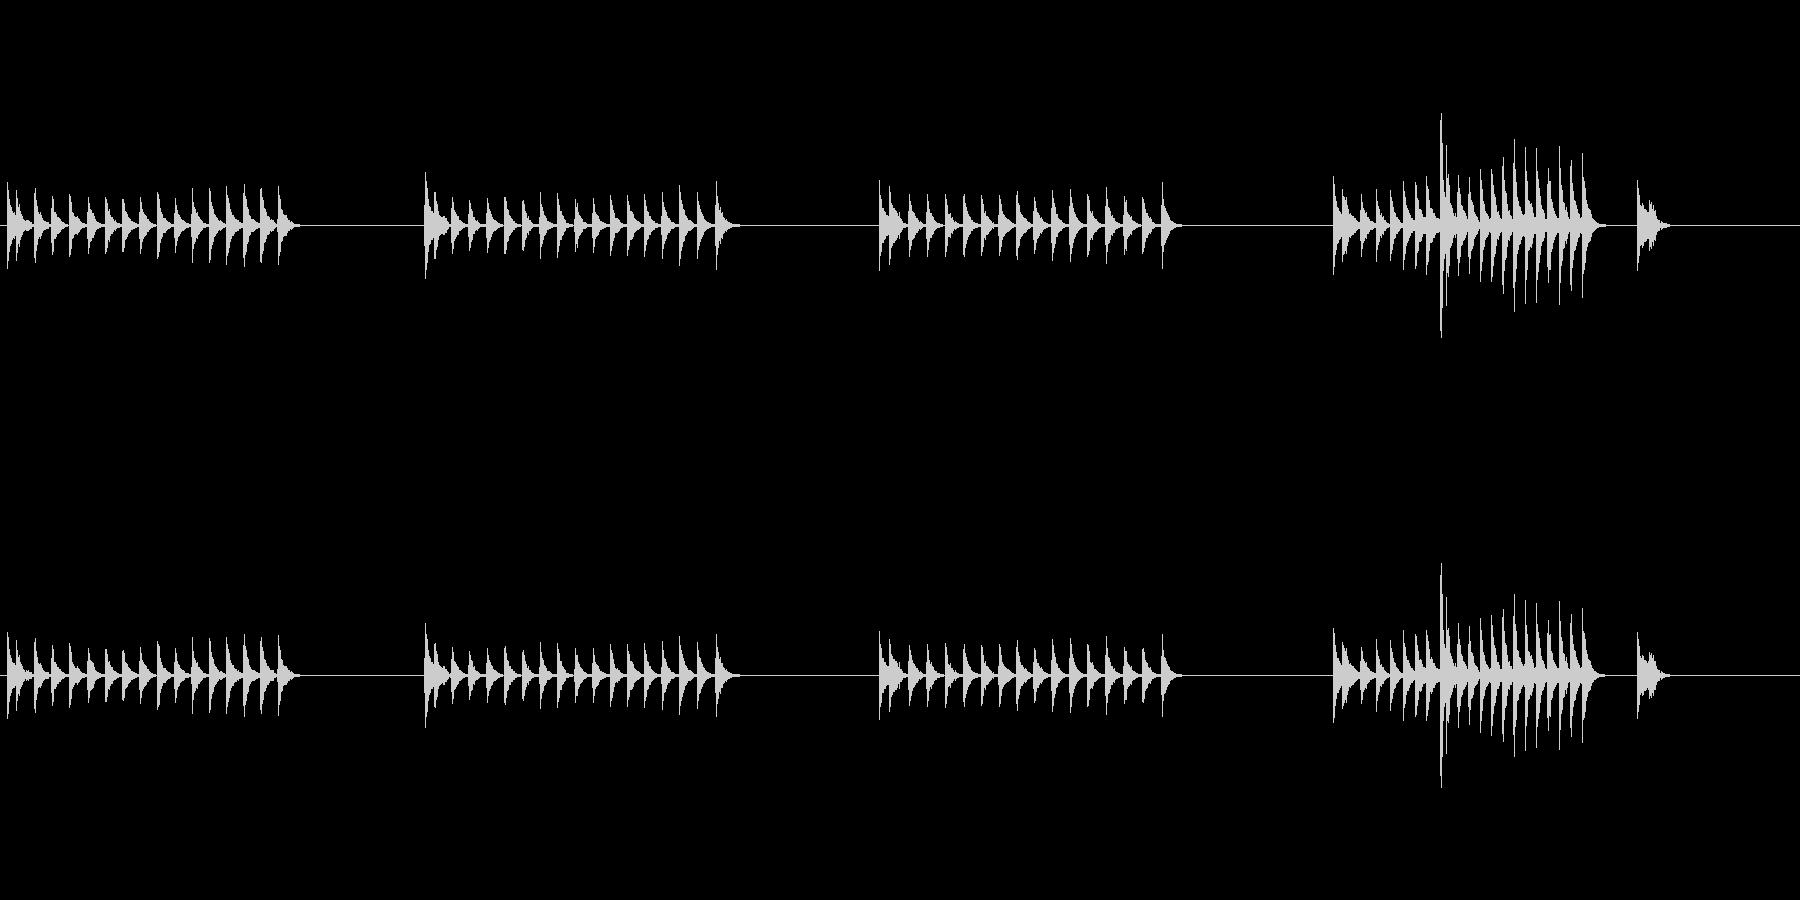 大太鼓23山ヲロシ歌舞伎情景描写和風和太の未再生の波形